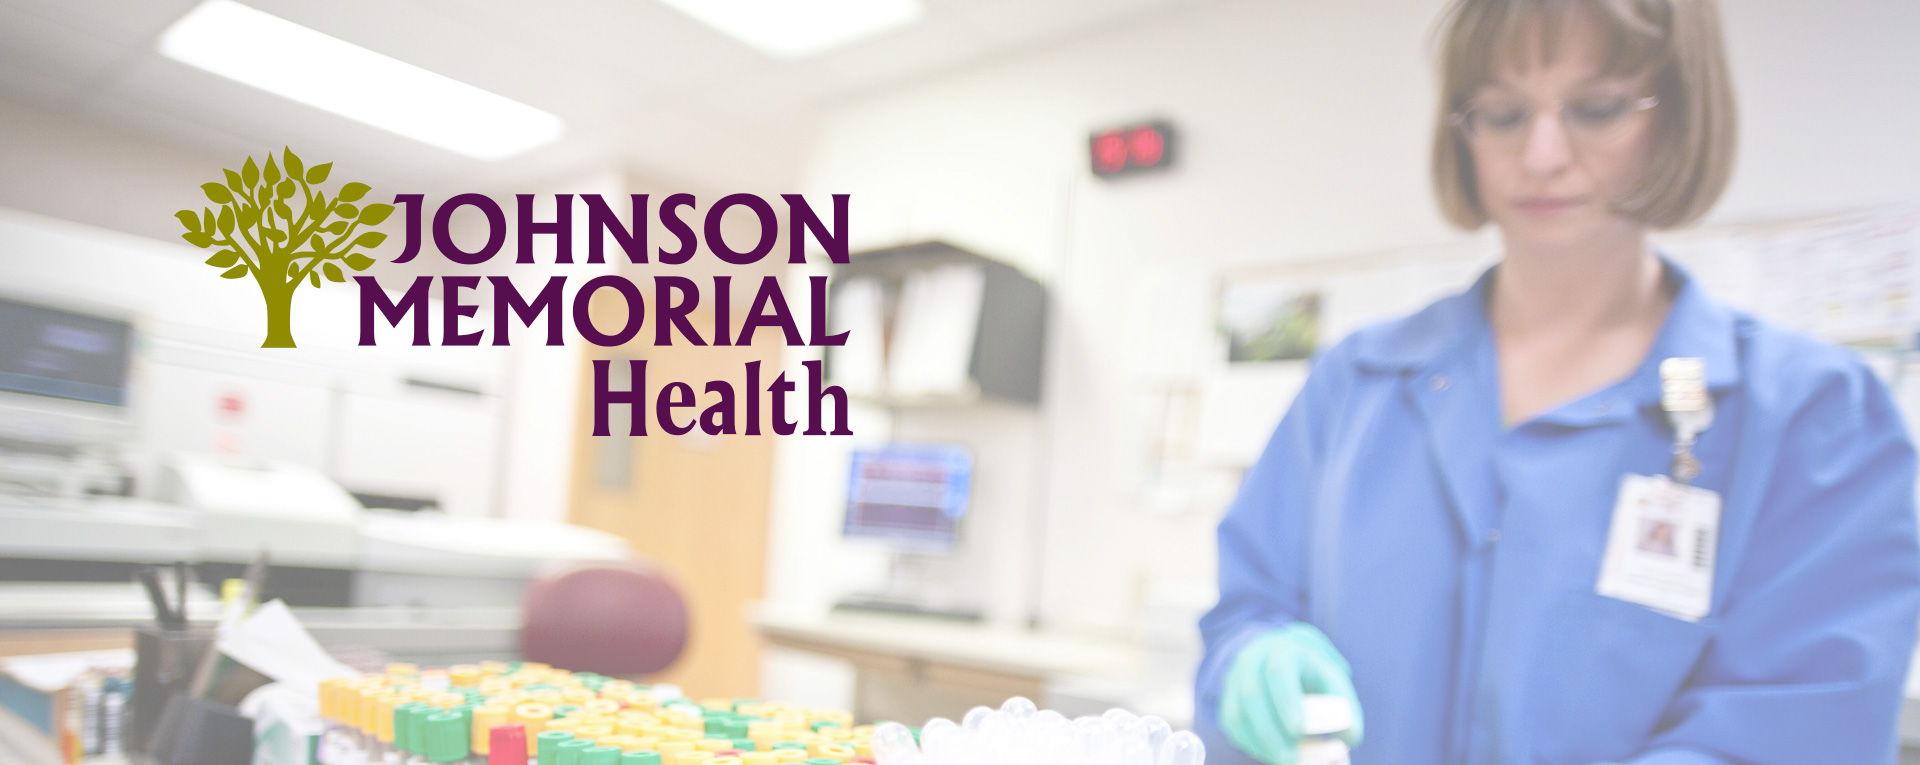 Johnson Memorial Health